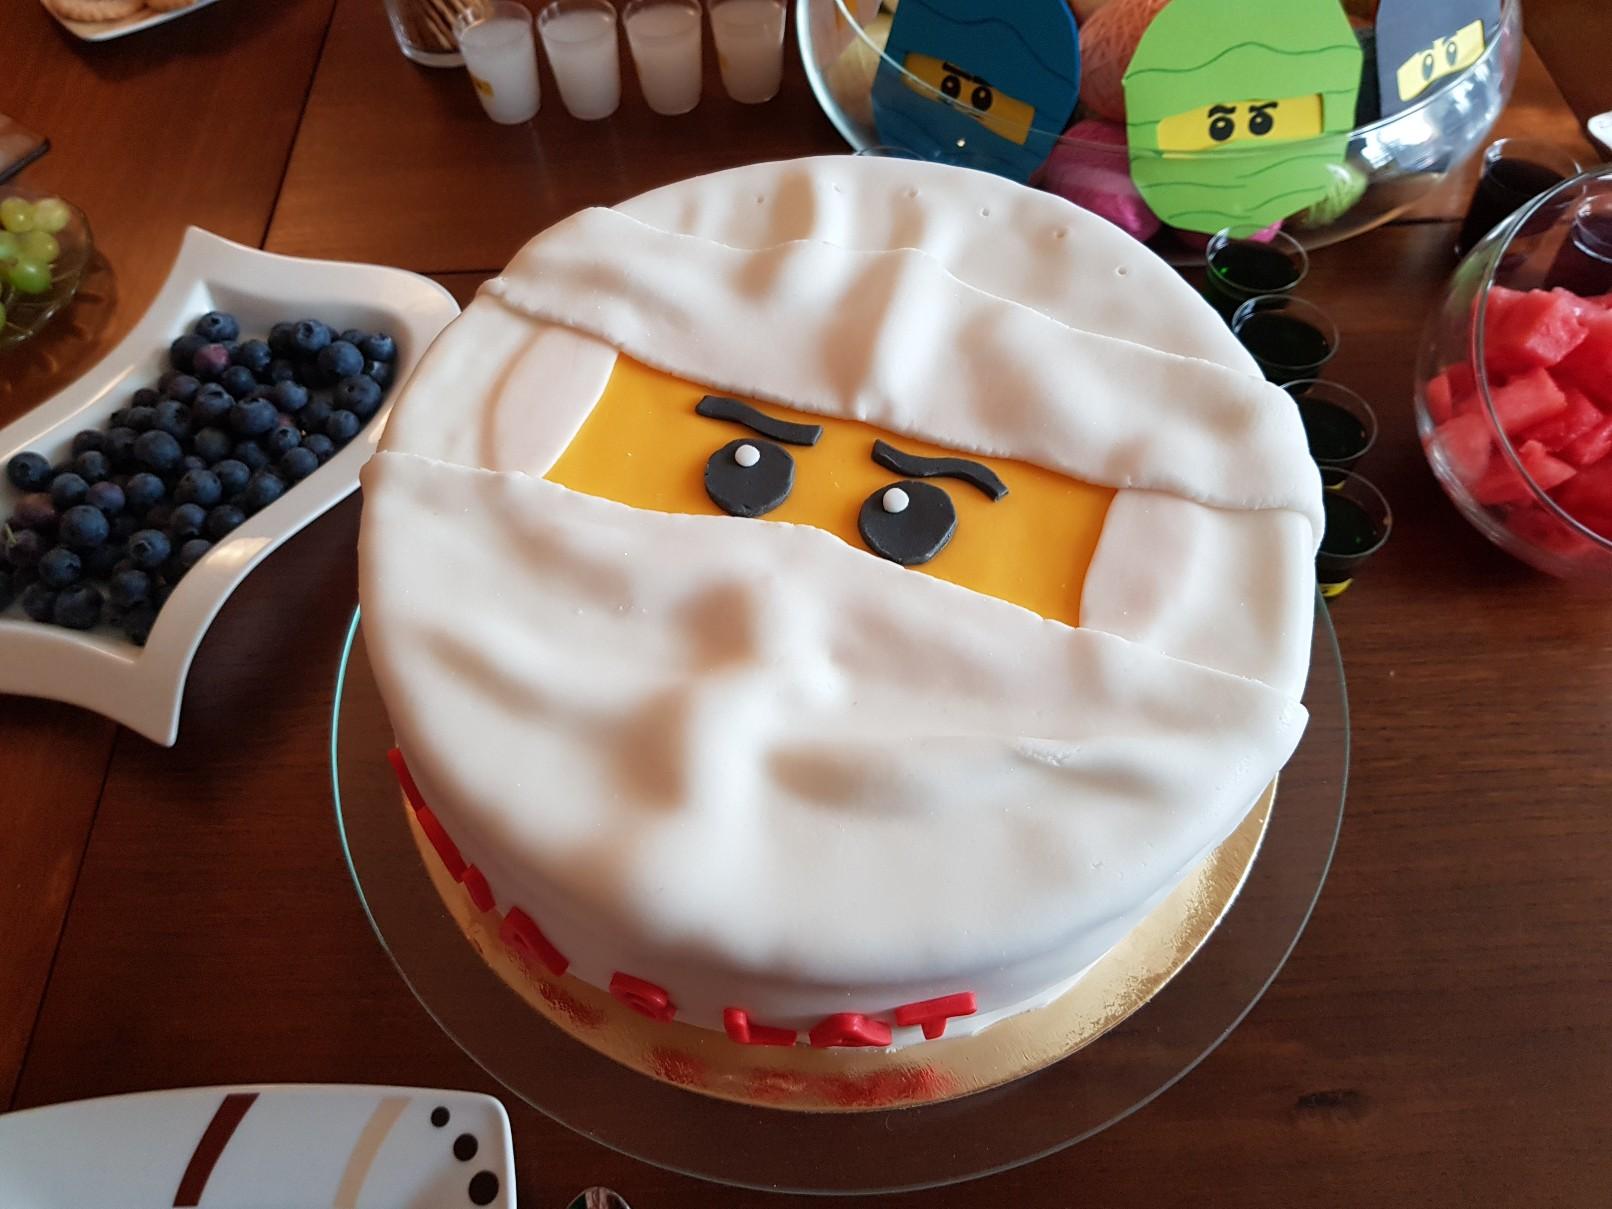 lego ninjago birthday cake final top